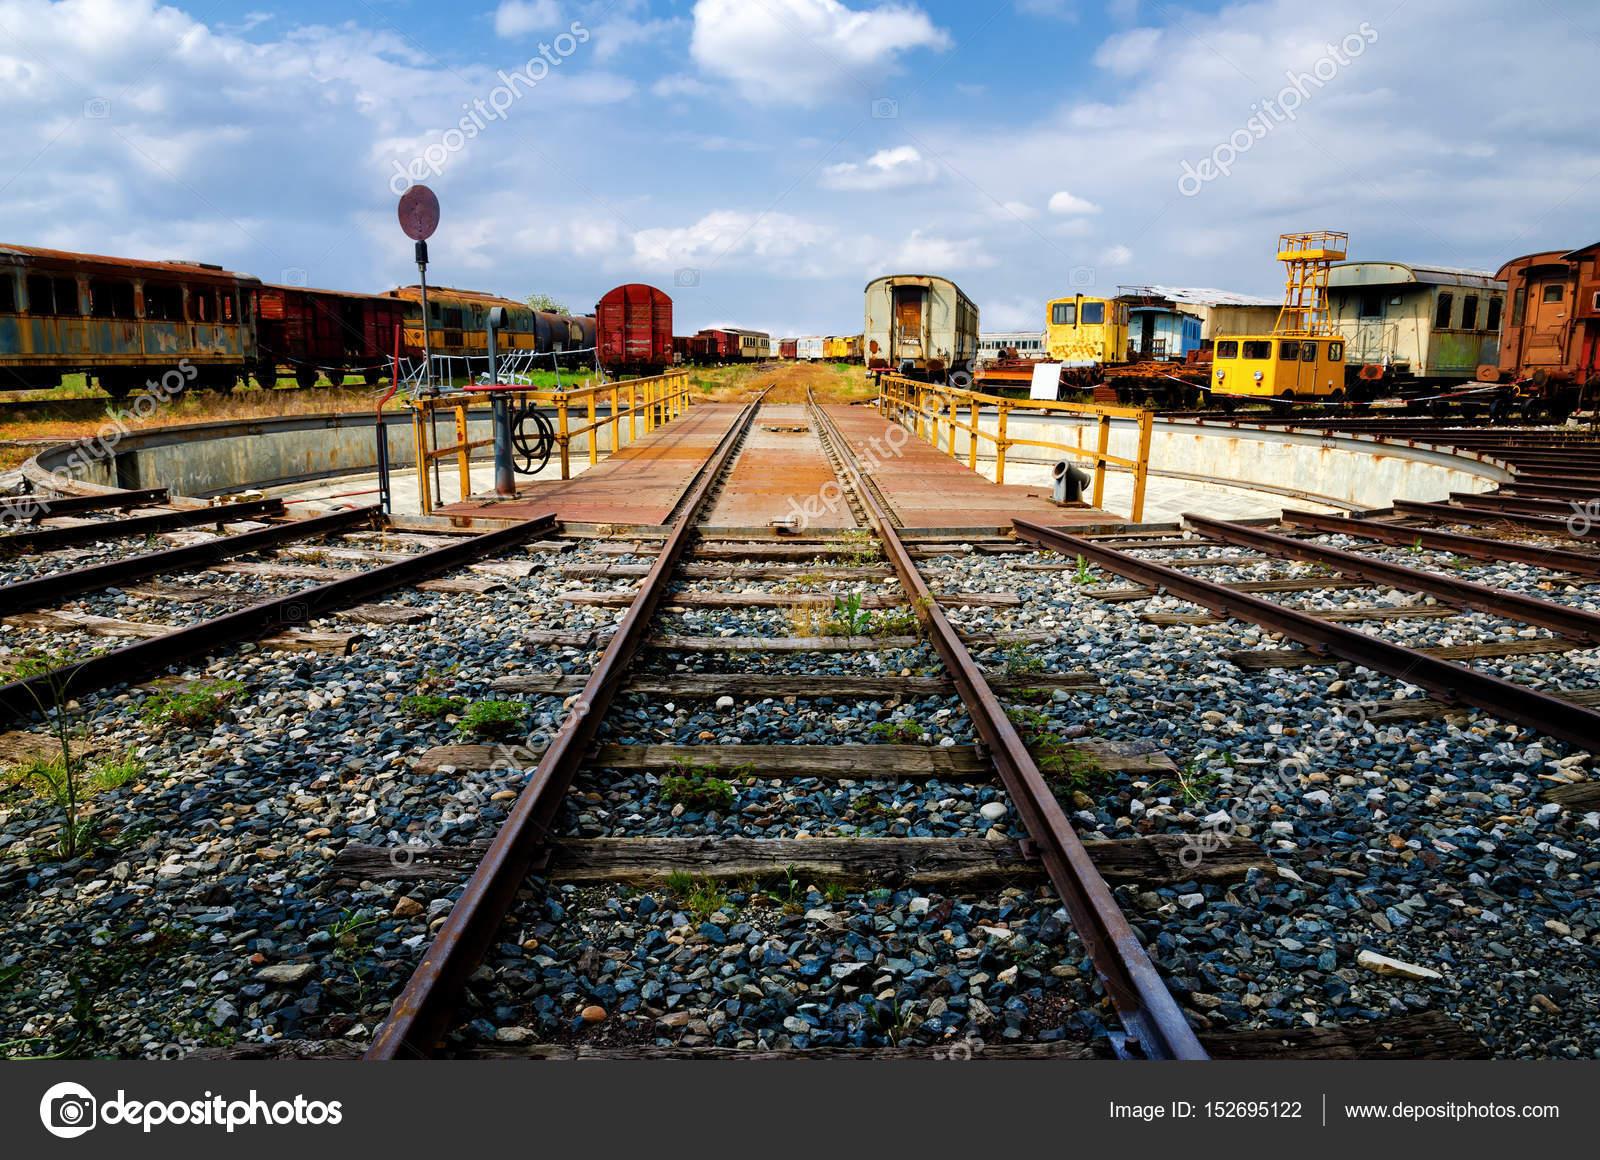 Photos: railroad turntable | Old railway turntable — Stock